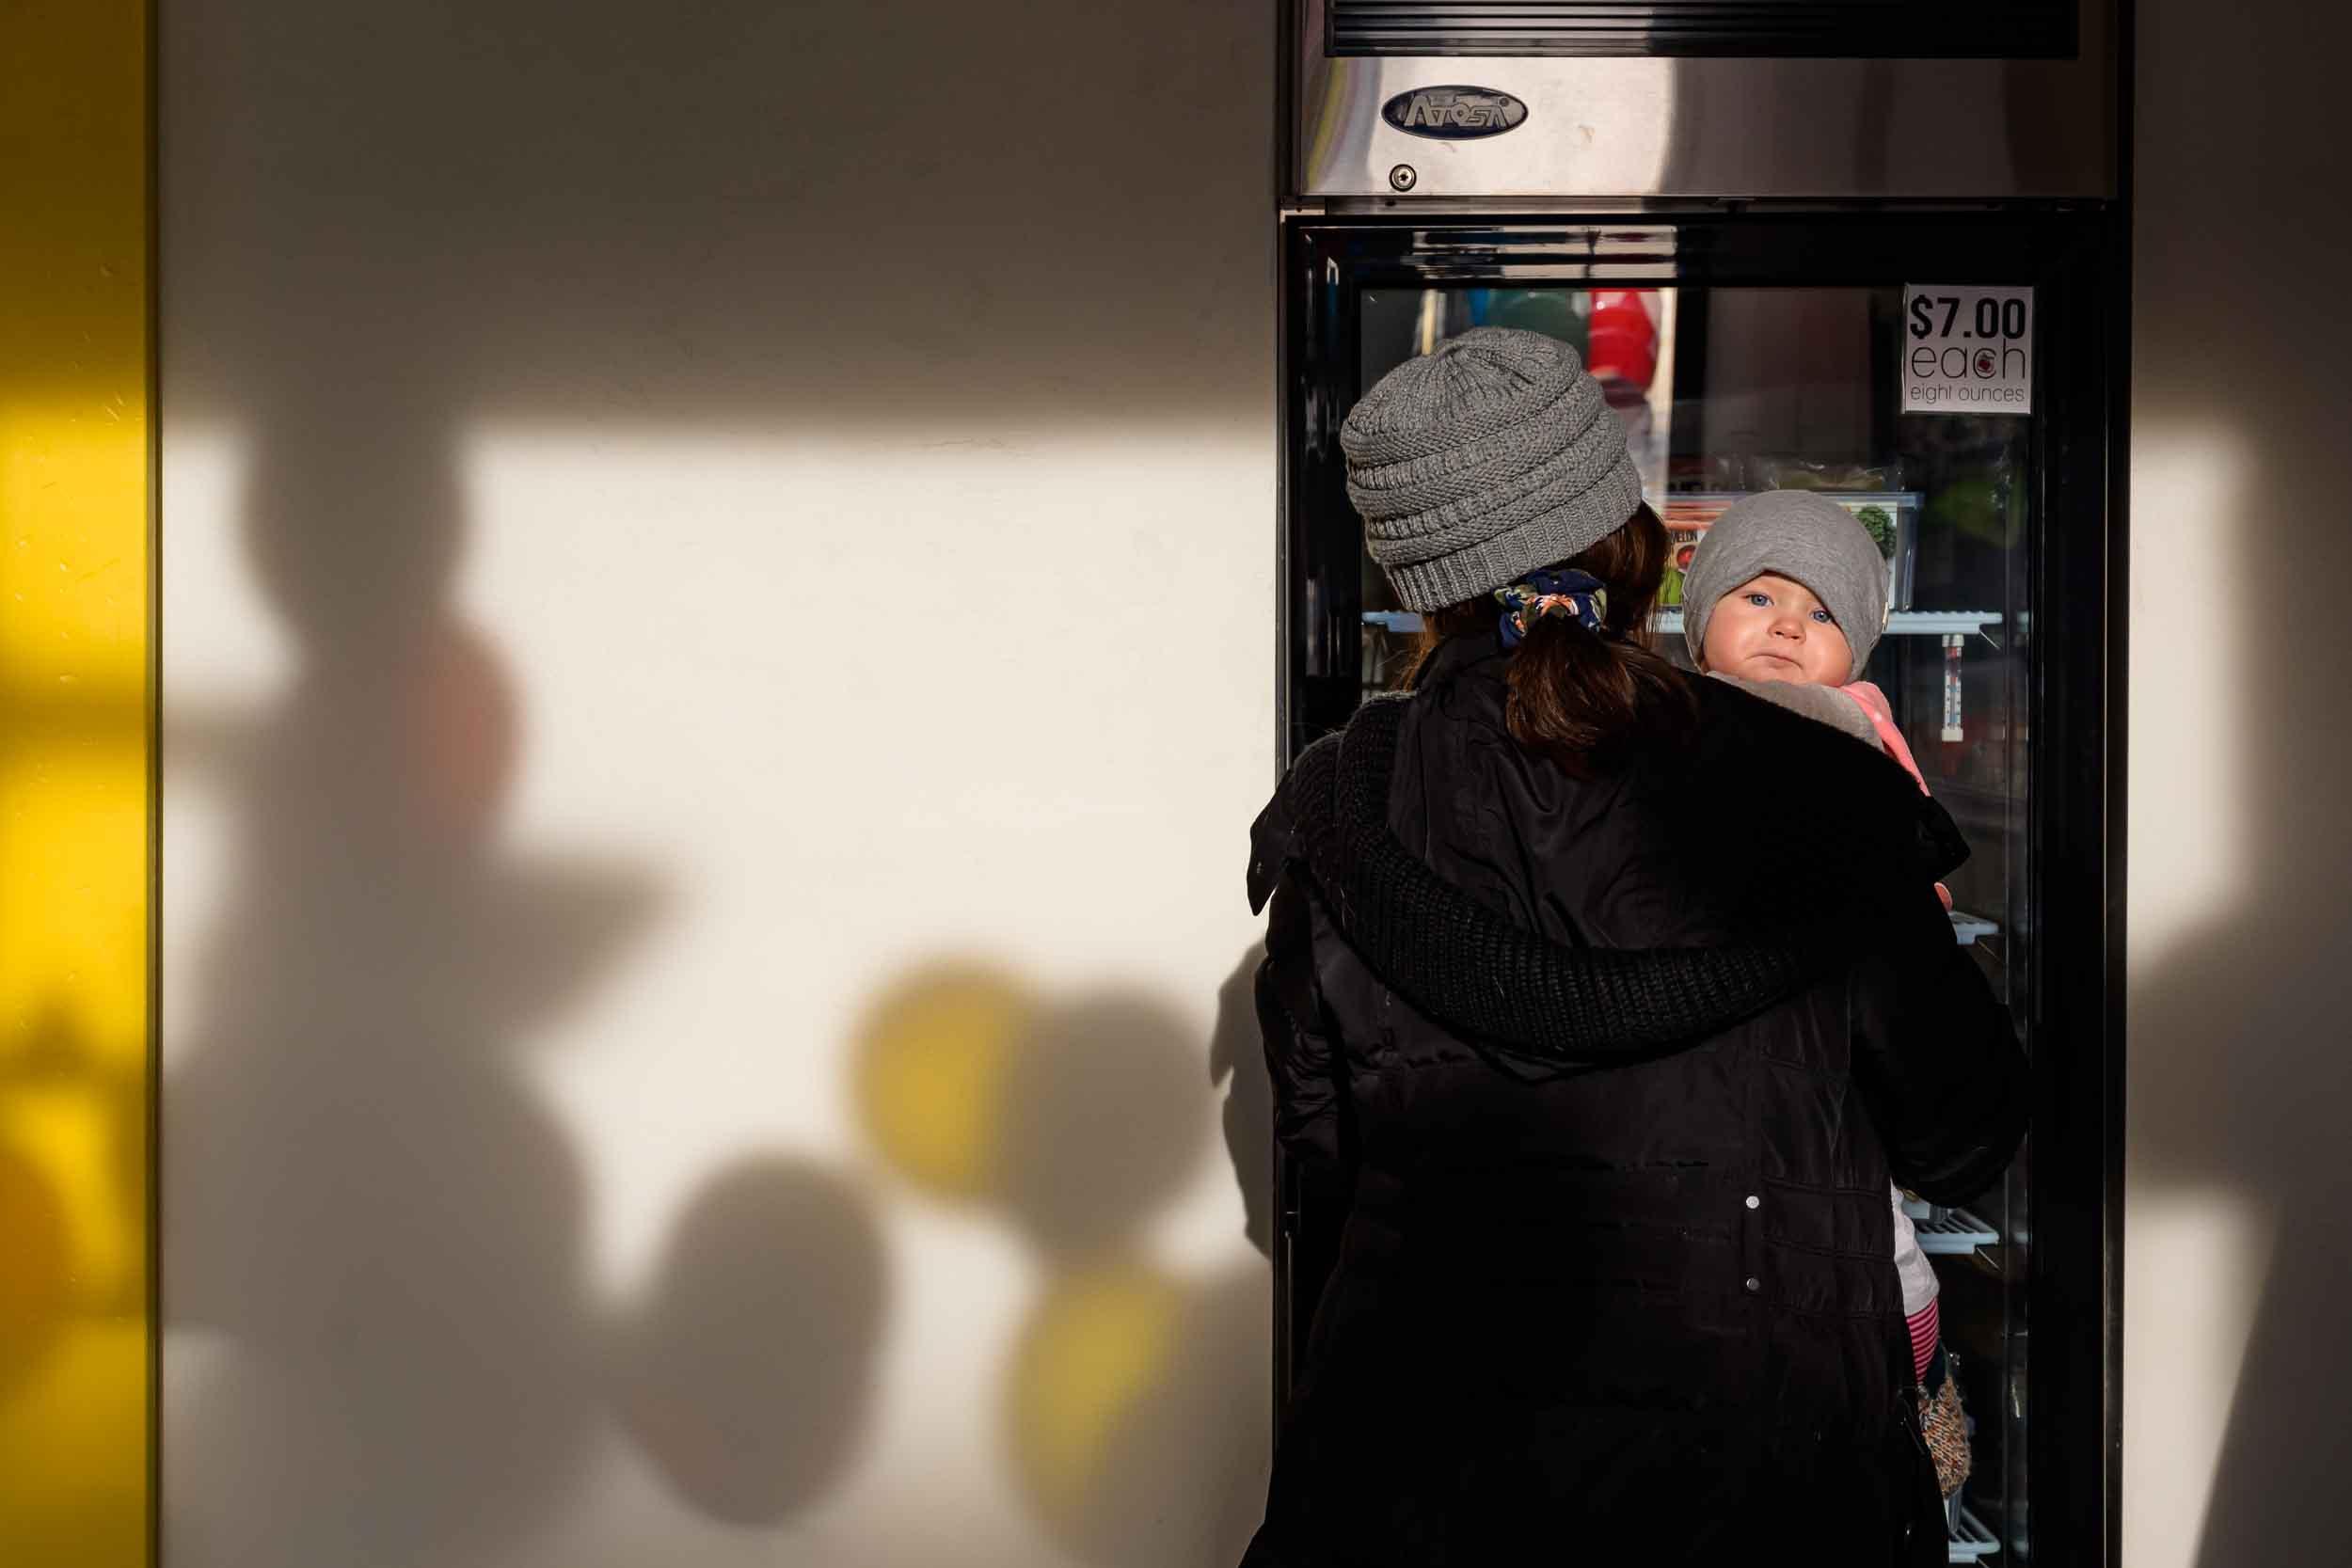 little-food-co-grand-opening-business-commercial-professional-photographer-graham-images-washatka-wisconsin-appleton-green-bay-006-0810-blog.jpg